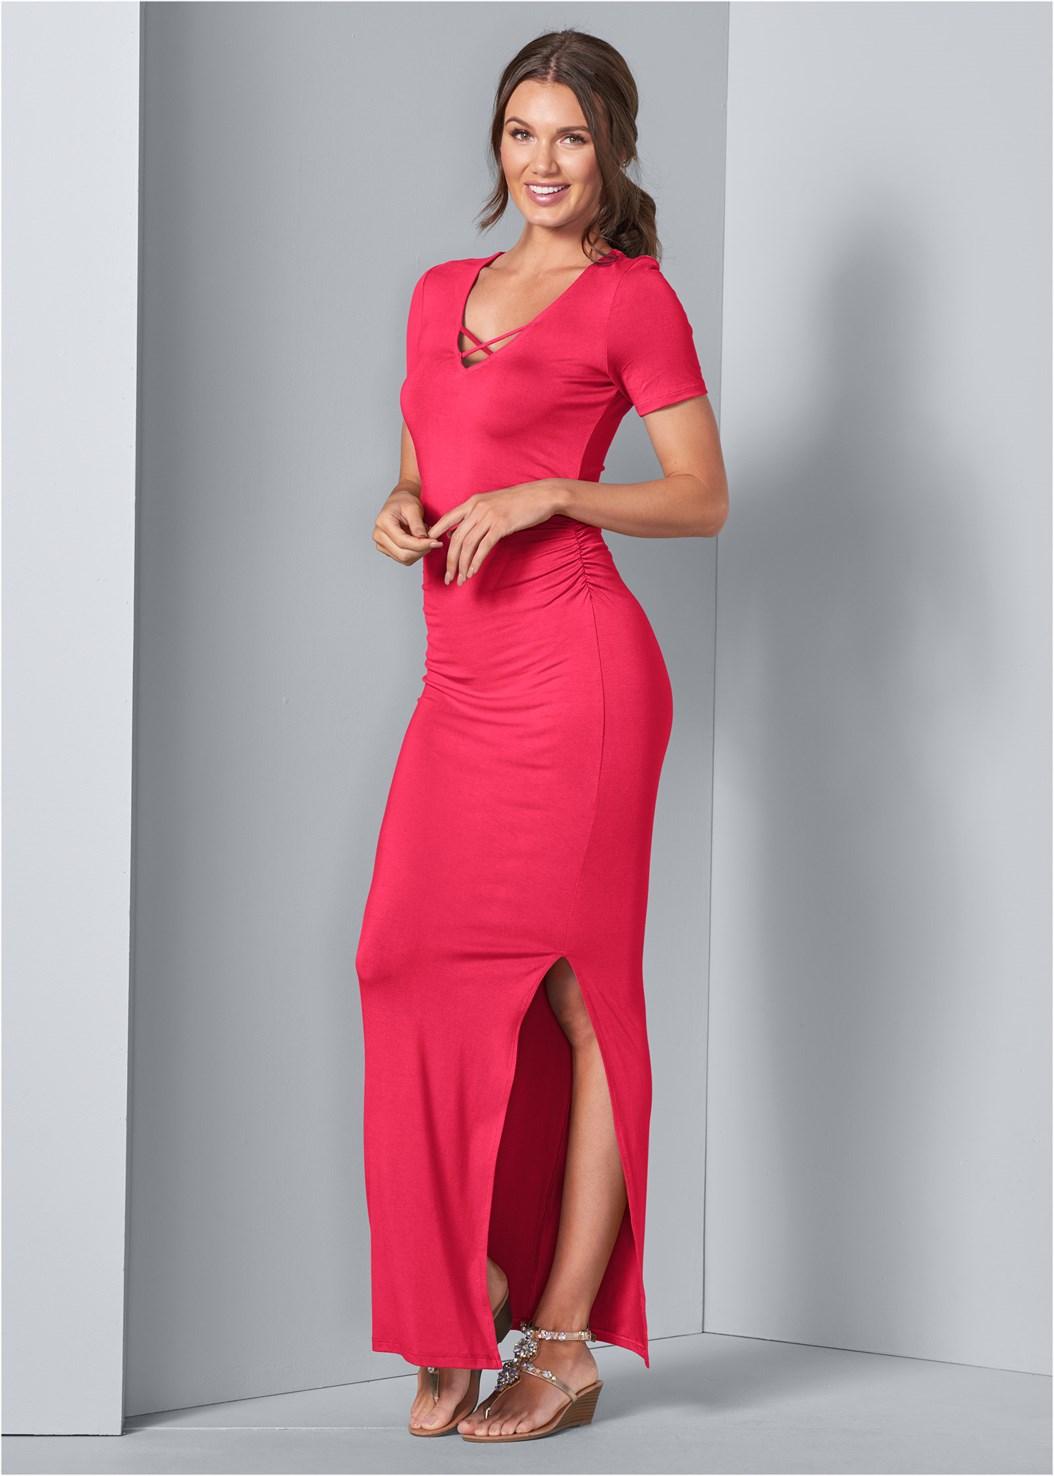 Ruched Maxi Dress,Embellished Low Wedges,Quilted Belt Bag